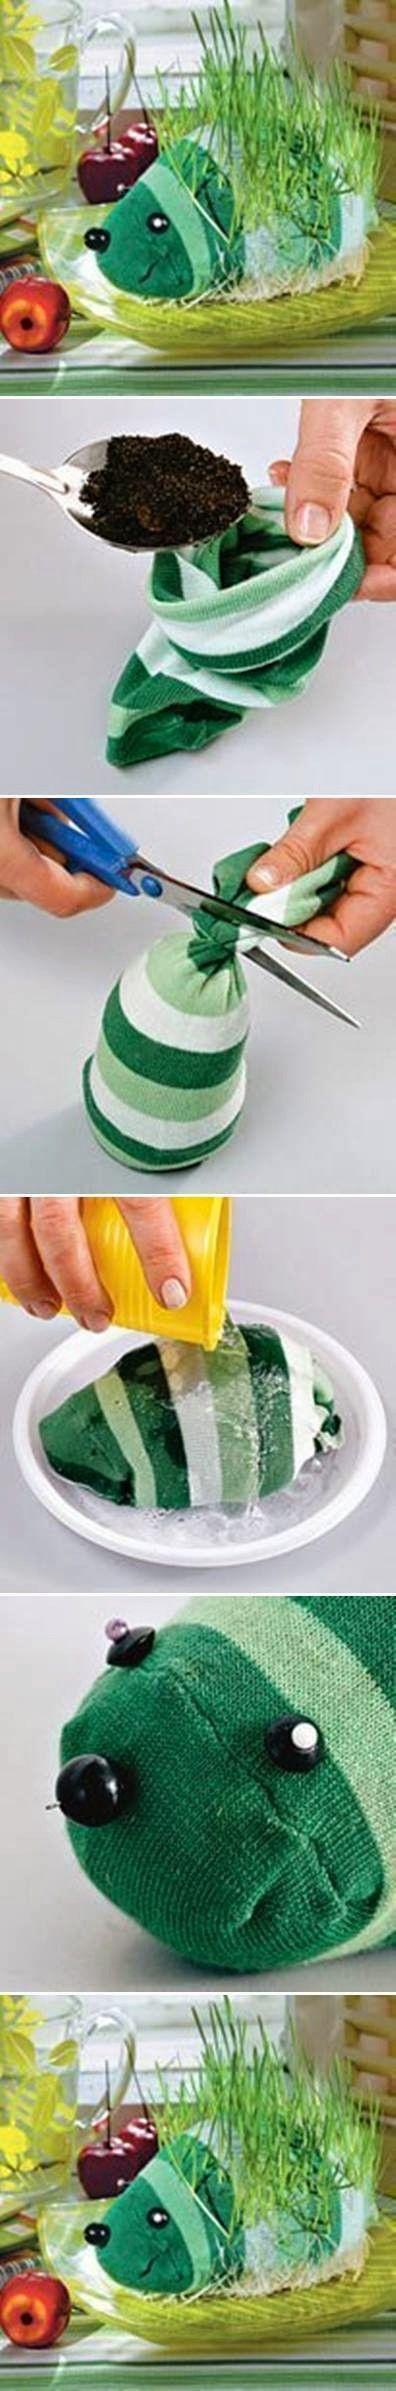 Socken Igel für Gras, Kresse uä - DIY : Sock Growing Grass Hedgehog